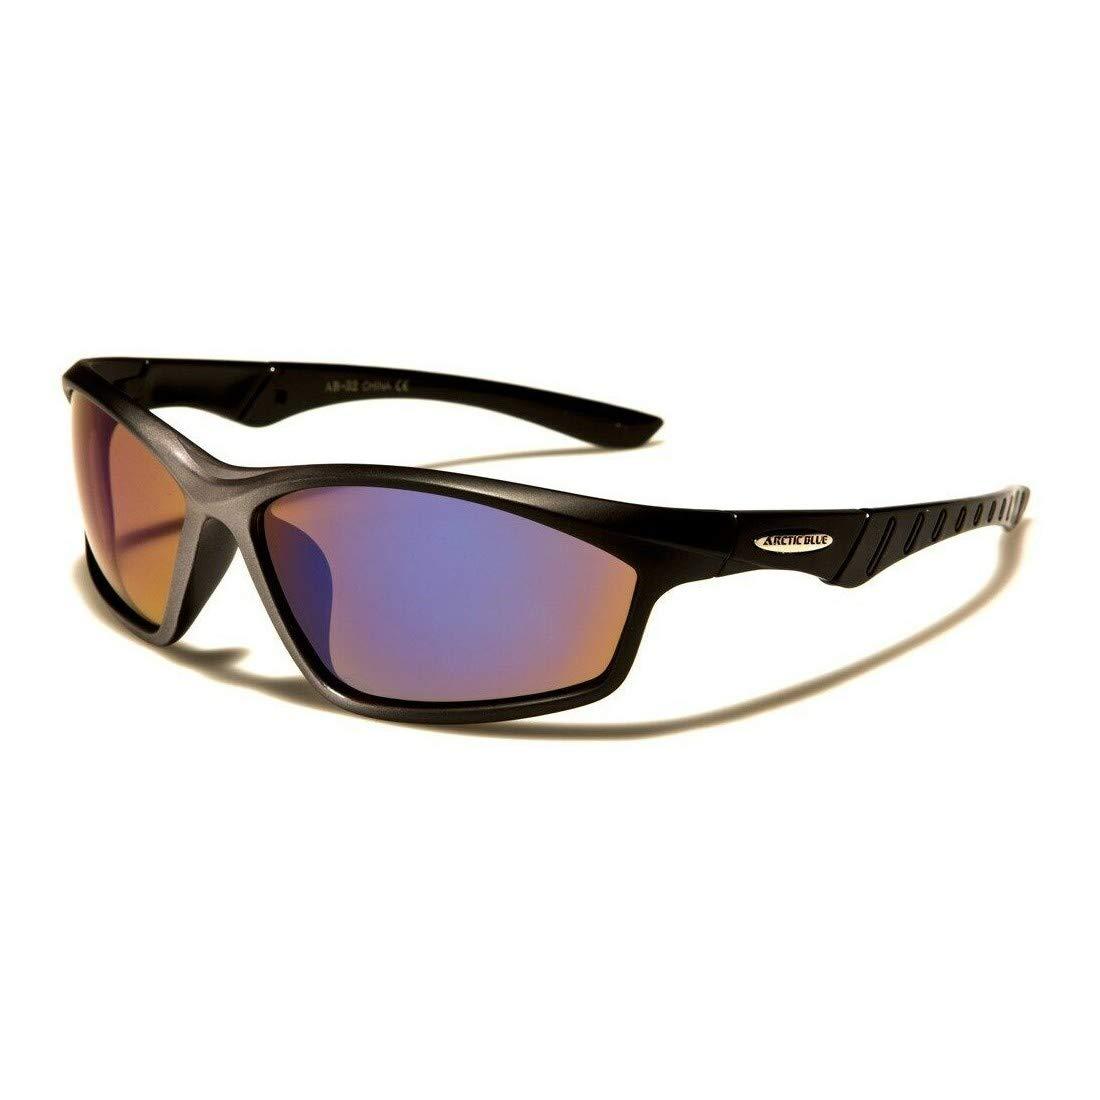 Arctic Blue Two Tone Frame Anti Glare Lens Mens Fashion Sunglasses